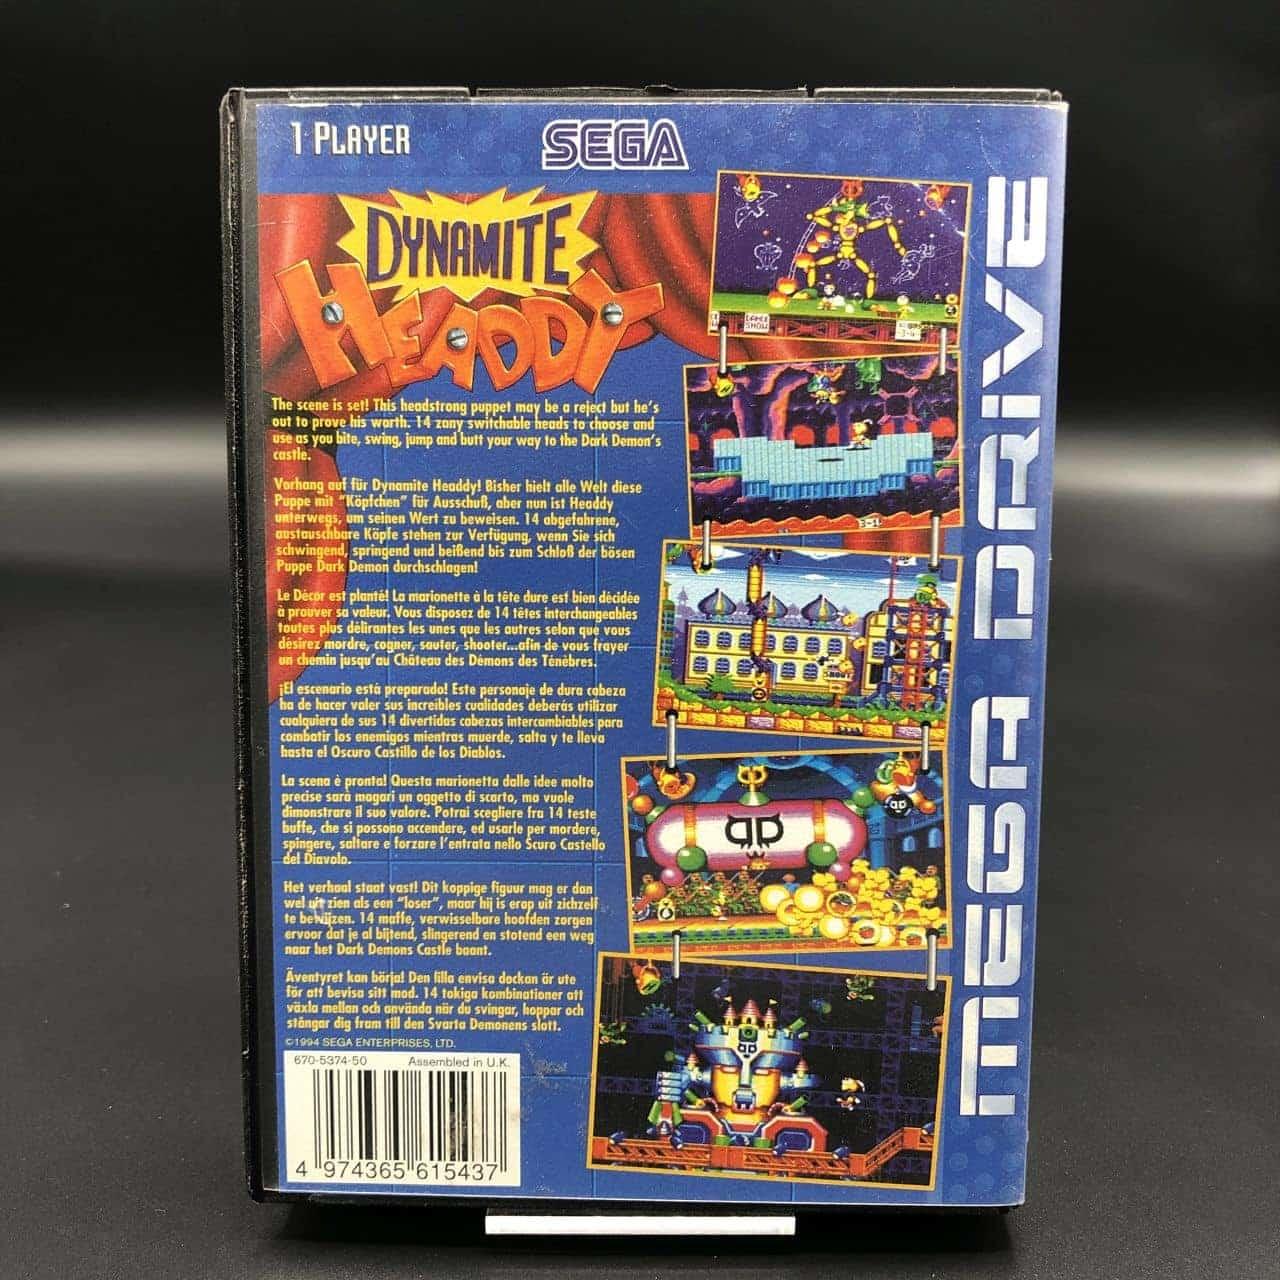 Dynamite Headdy (ohne Anleitung) (Sehr gut) Sega Mega Drive